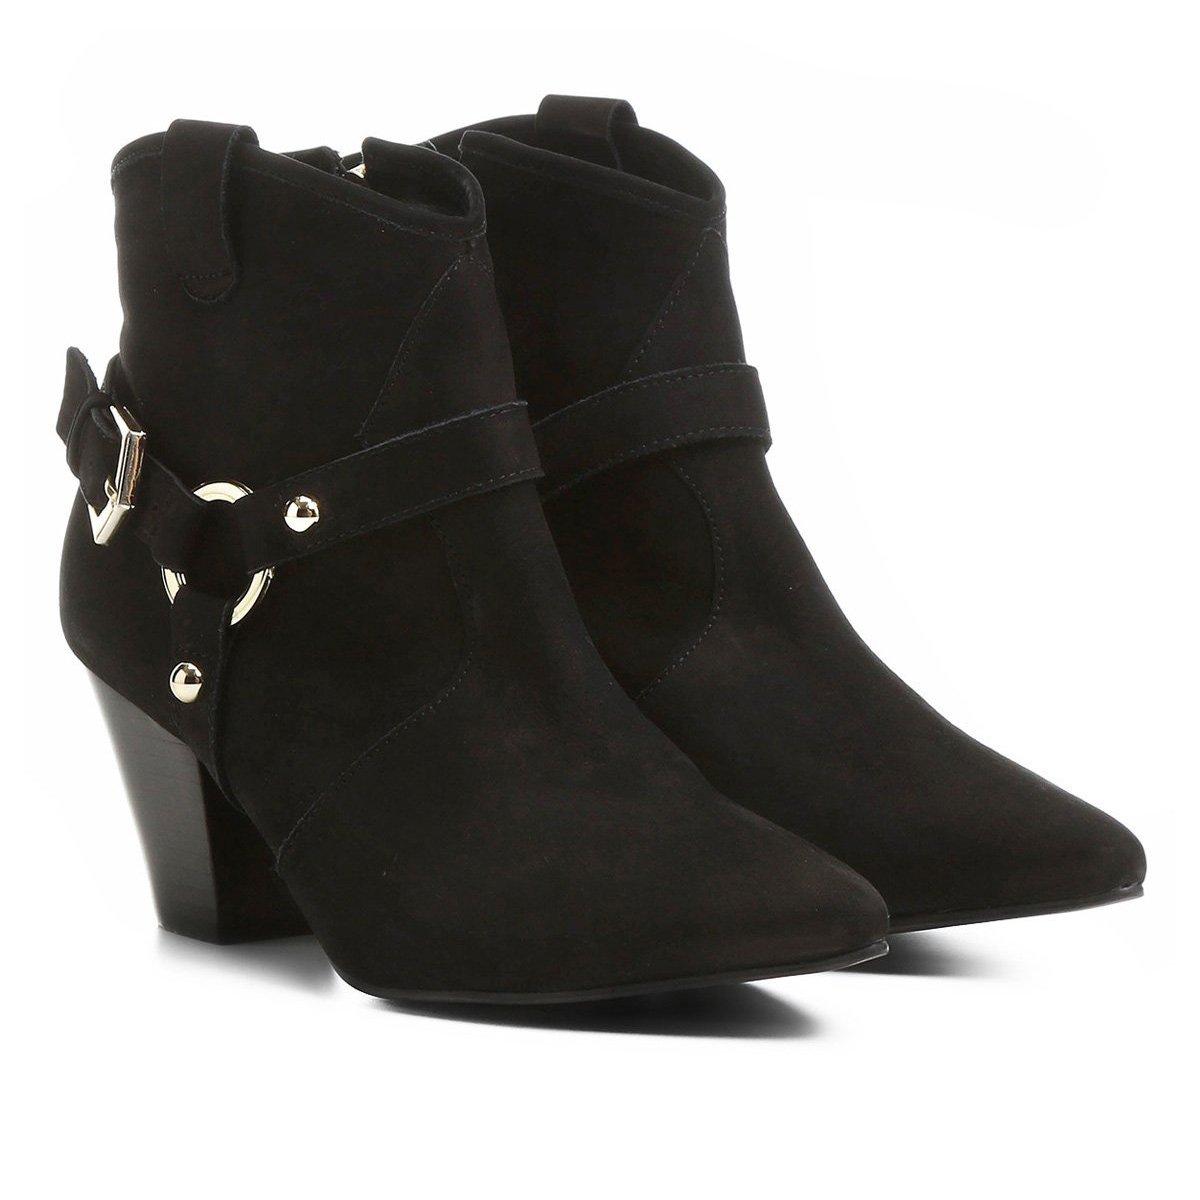 9147c16ac9 ... Bota Couro Country Shoestock Salto Selaria Feminina